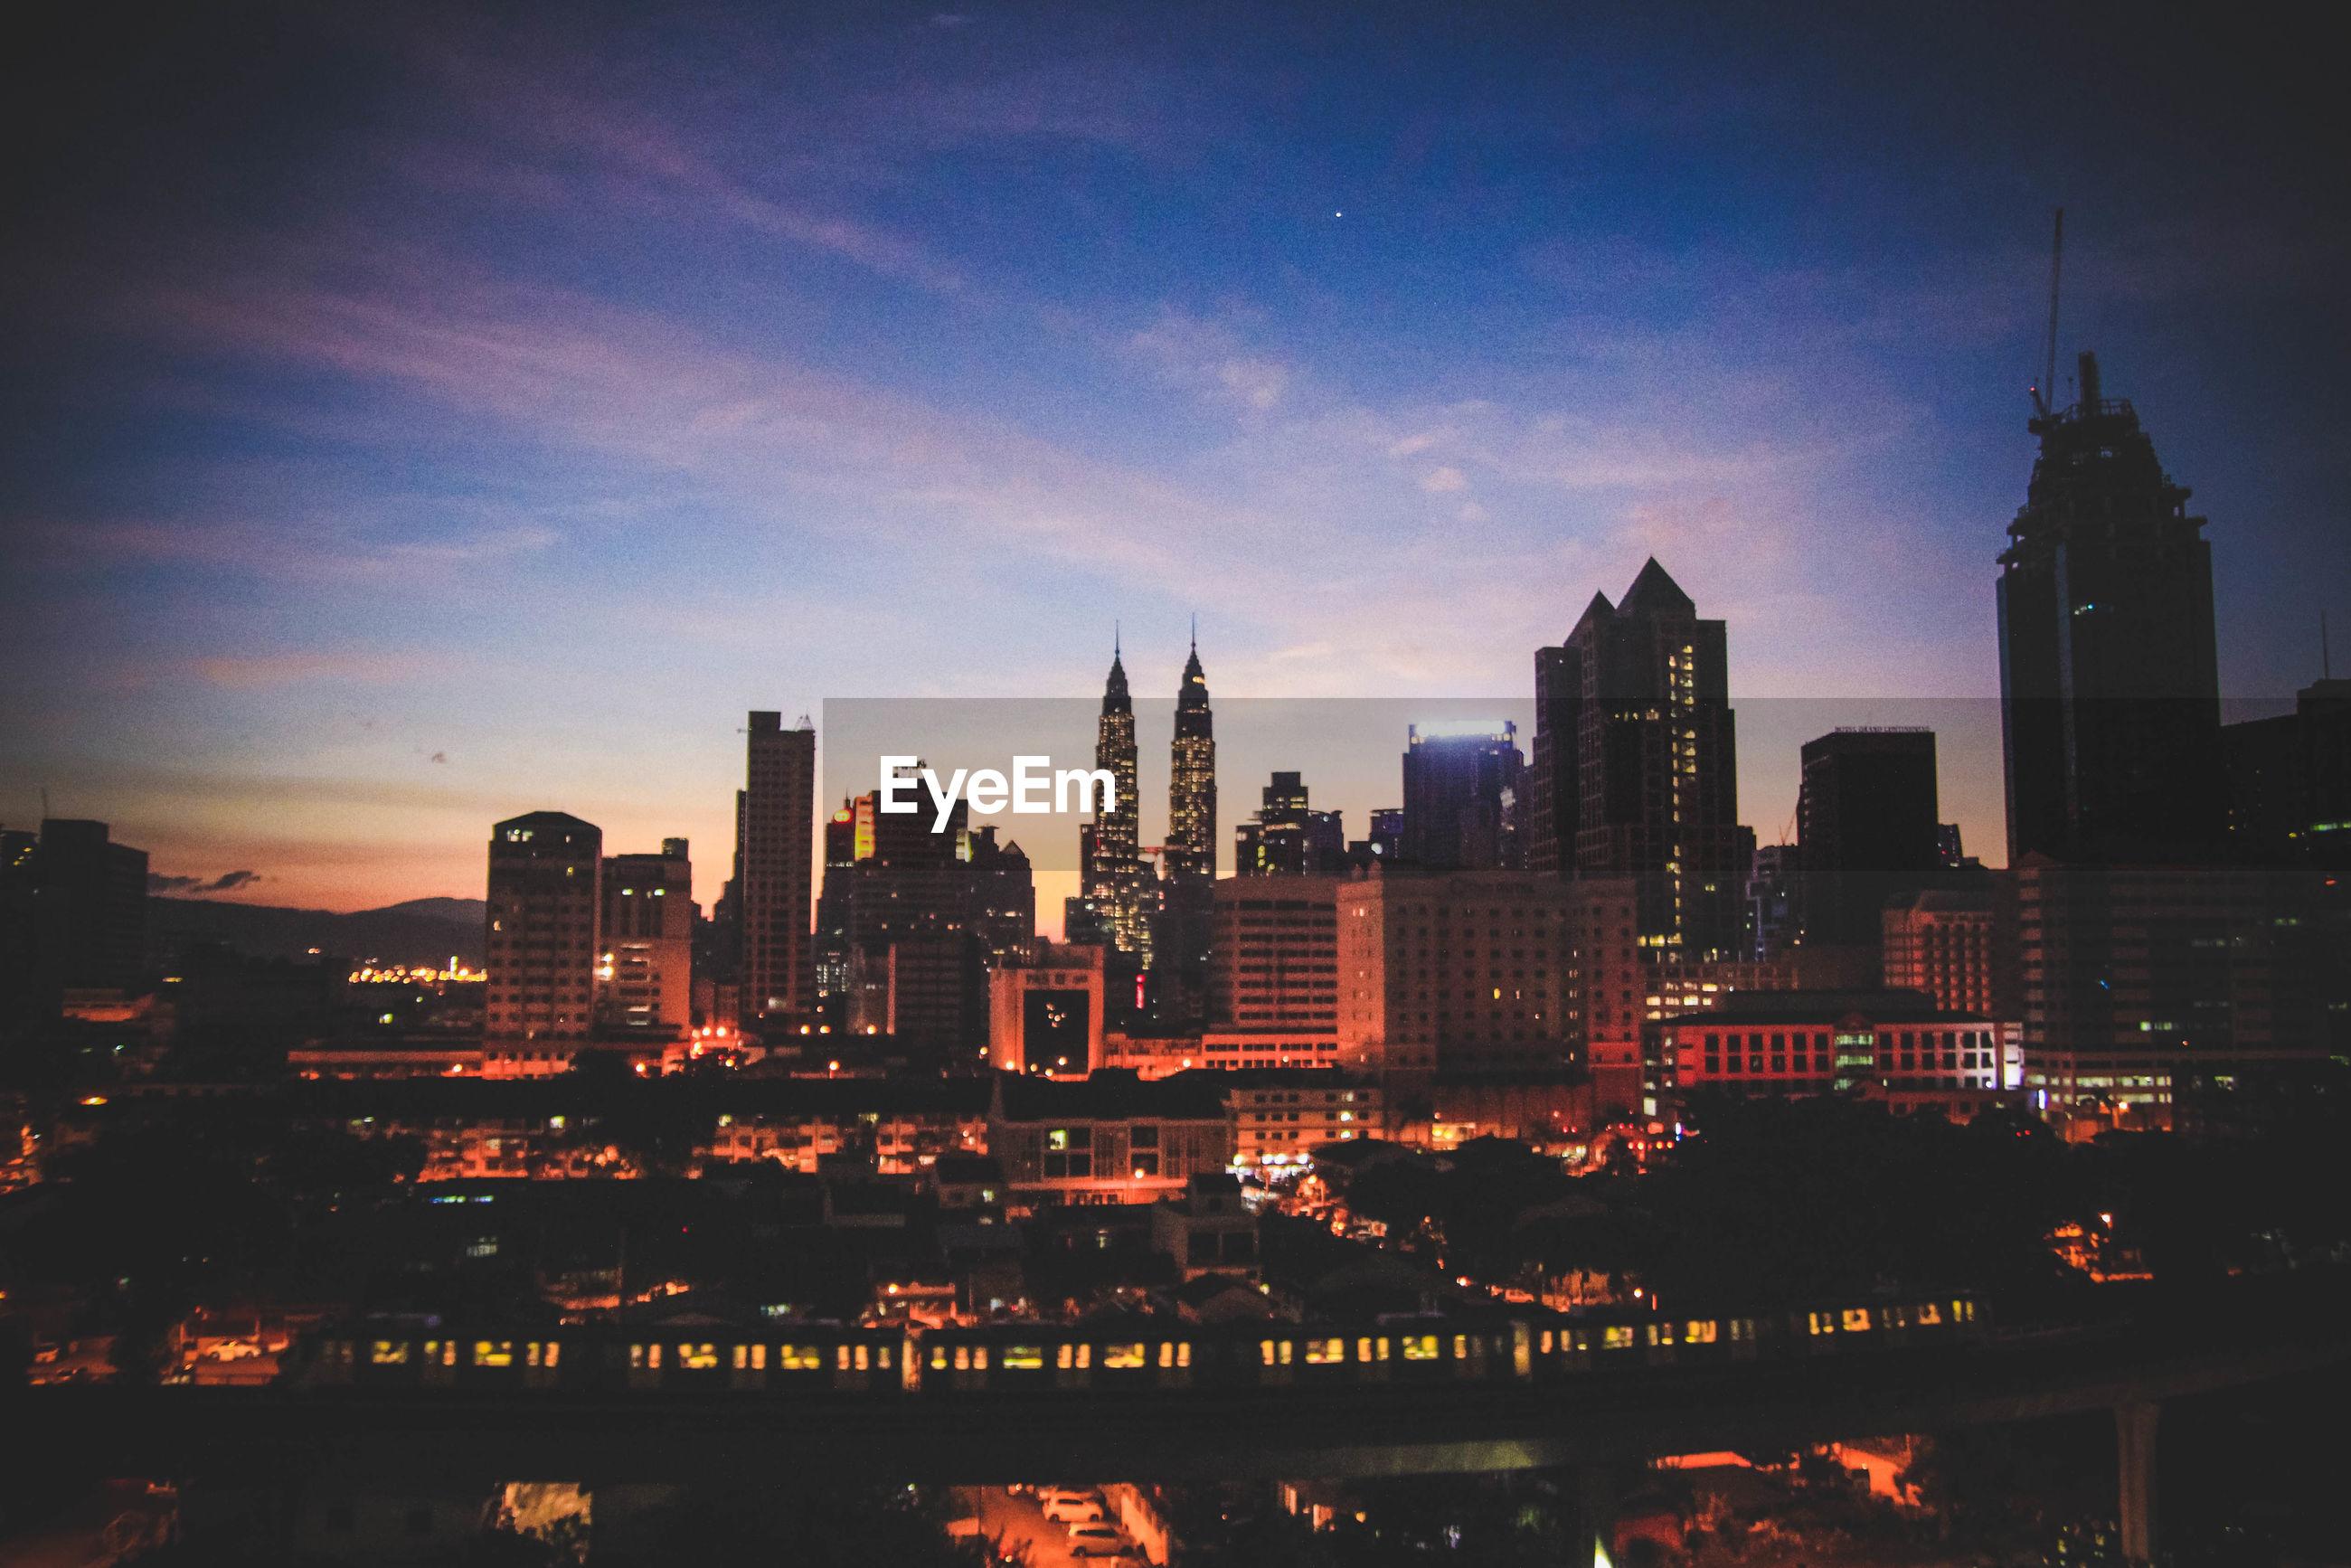 CITY LIT UP AGAINST SKY